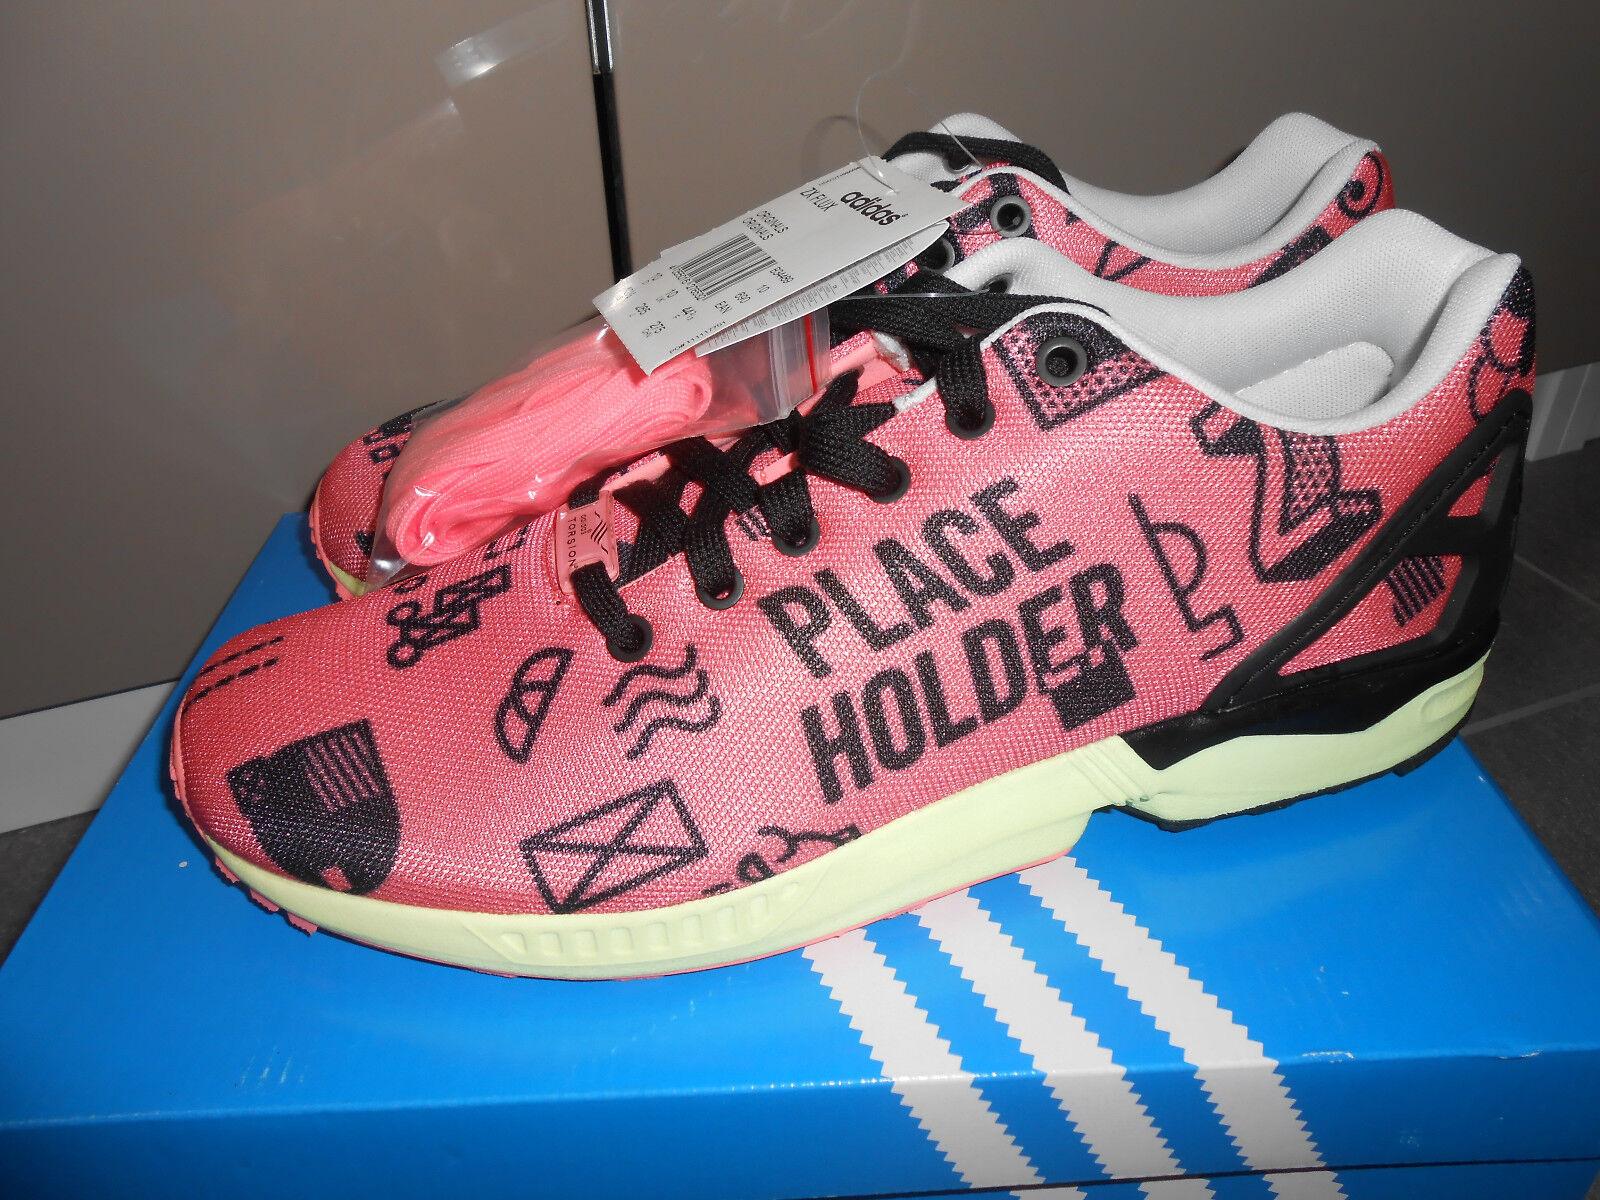 Neu Gr. Adidas ZX Flux Placeholder Gr. Neu 44 2/3 UK 10 Originals pink Torsion B34489 fa8b61